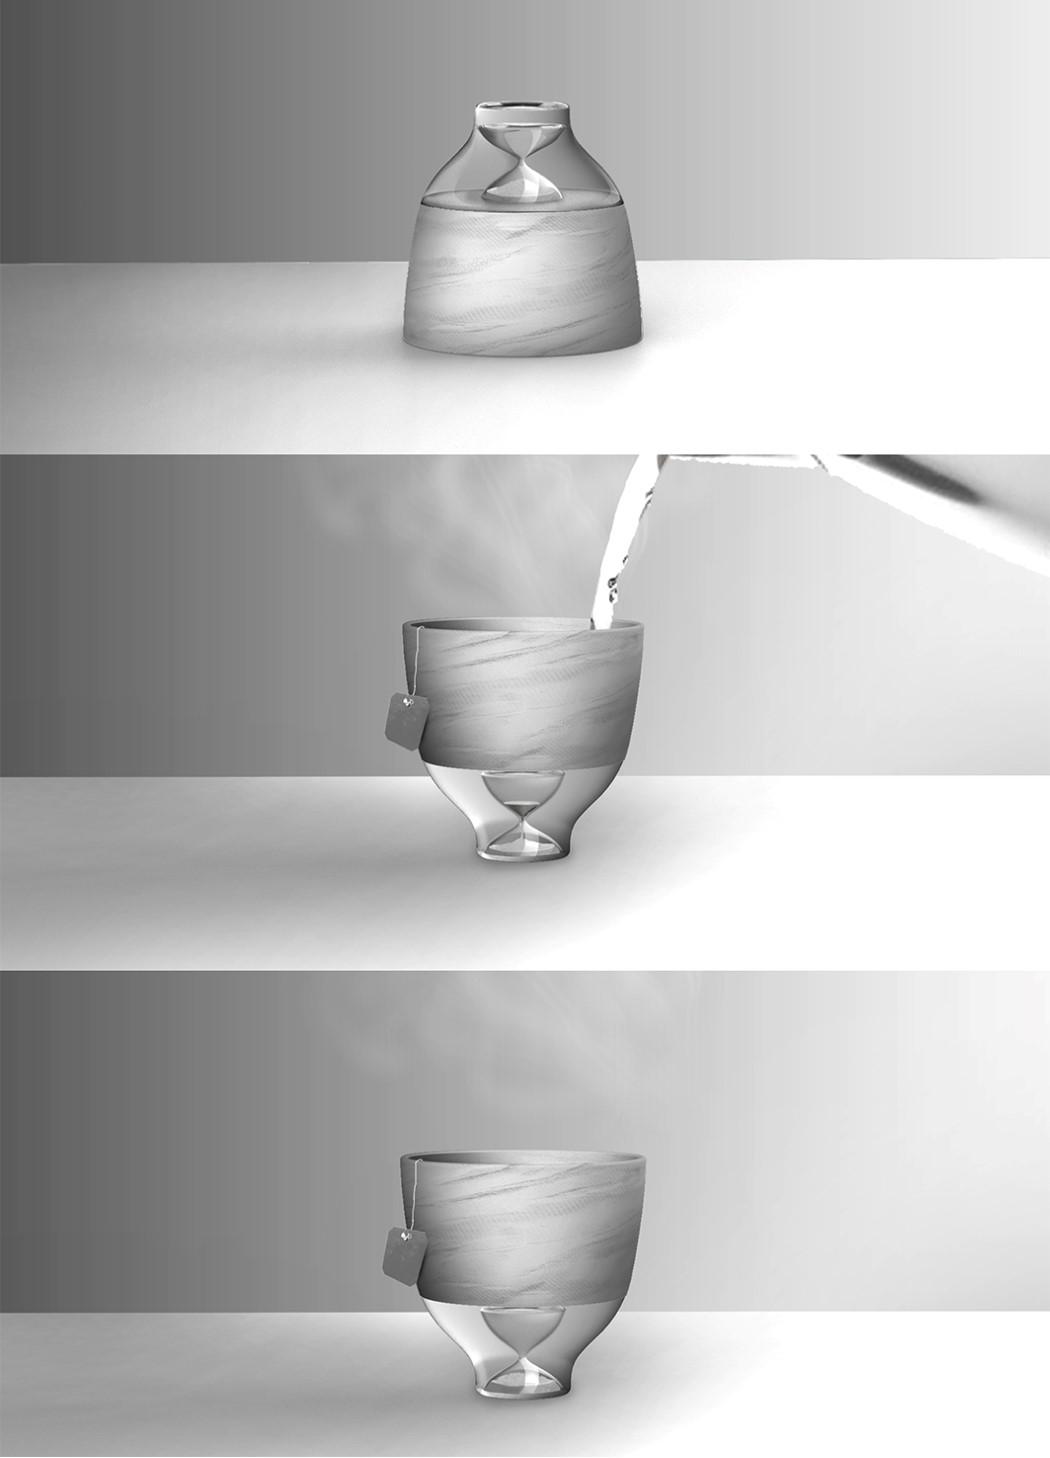 hourglass_teacup_3